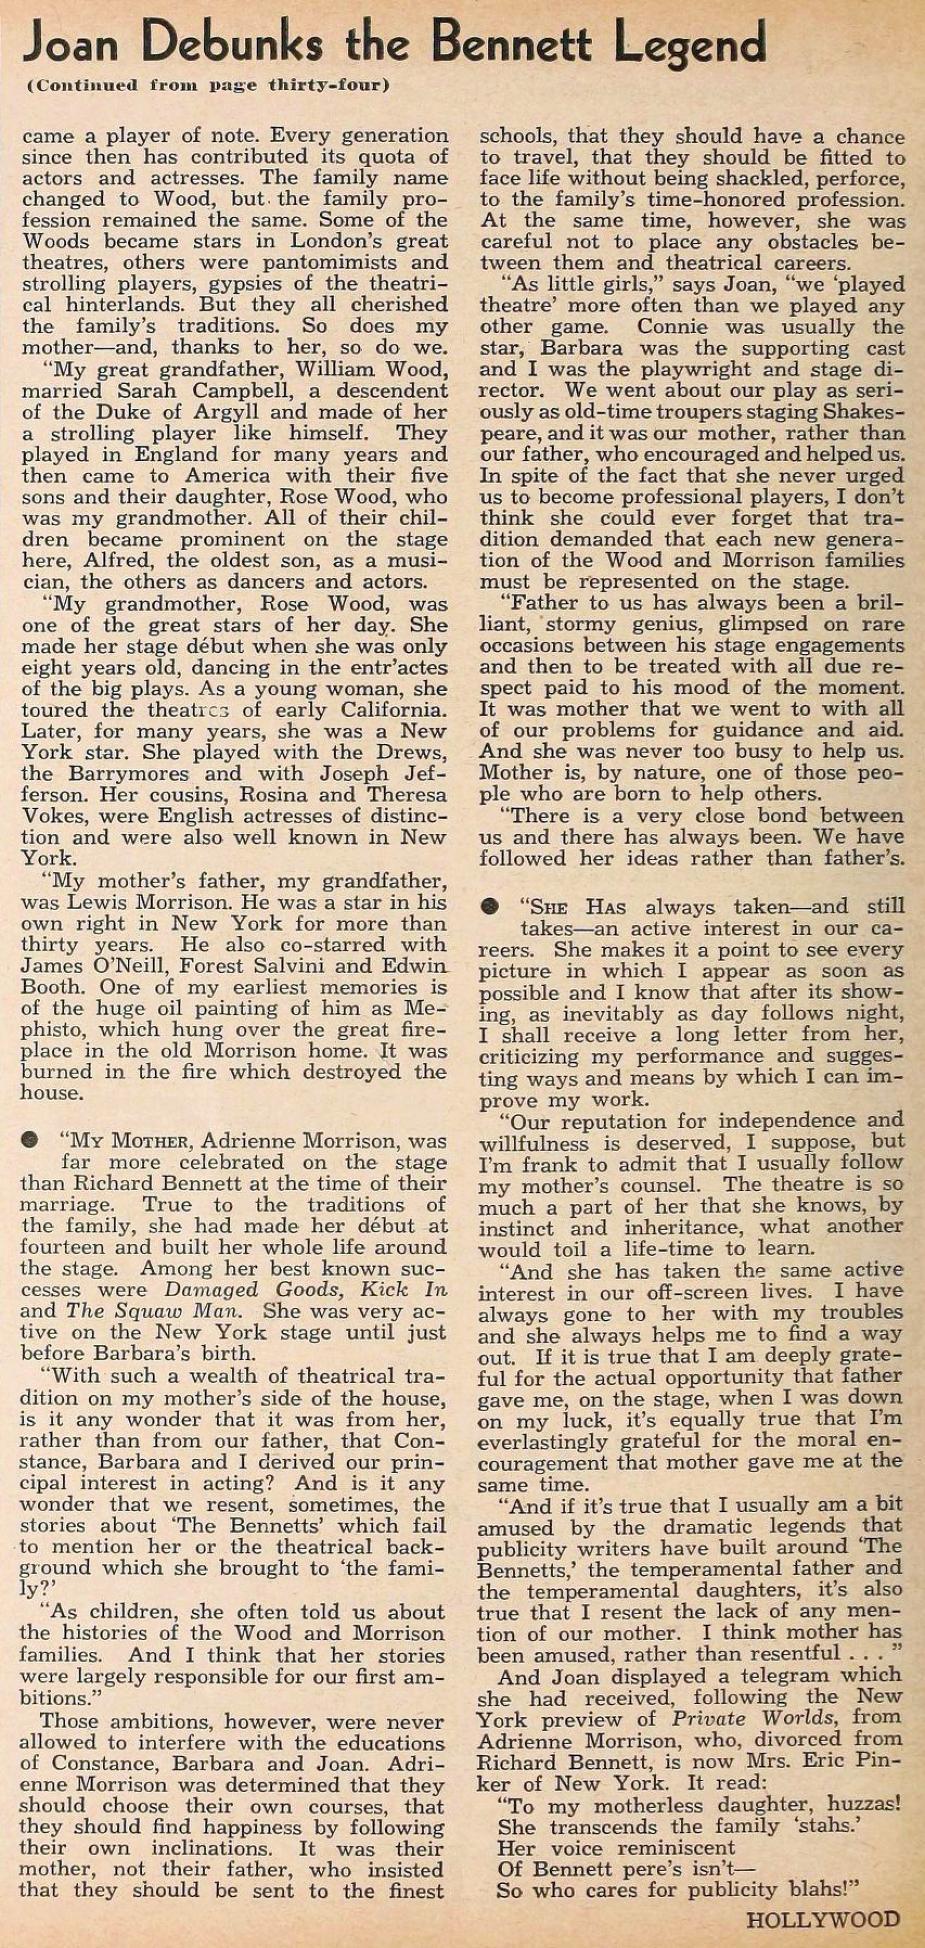 hollywood august 1935da